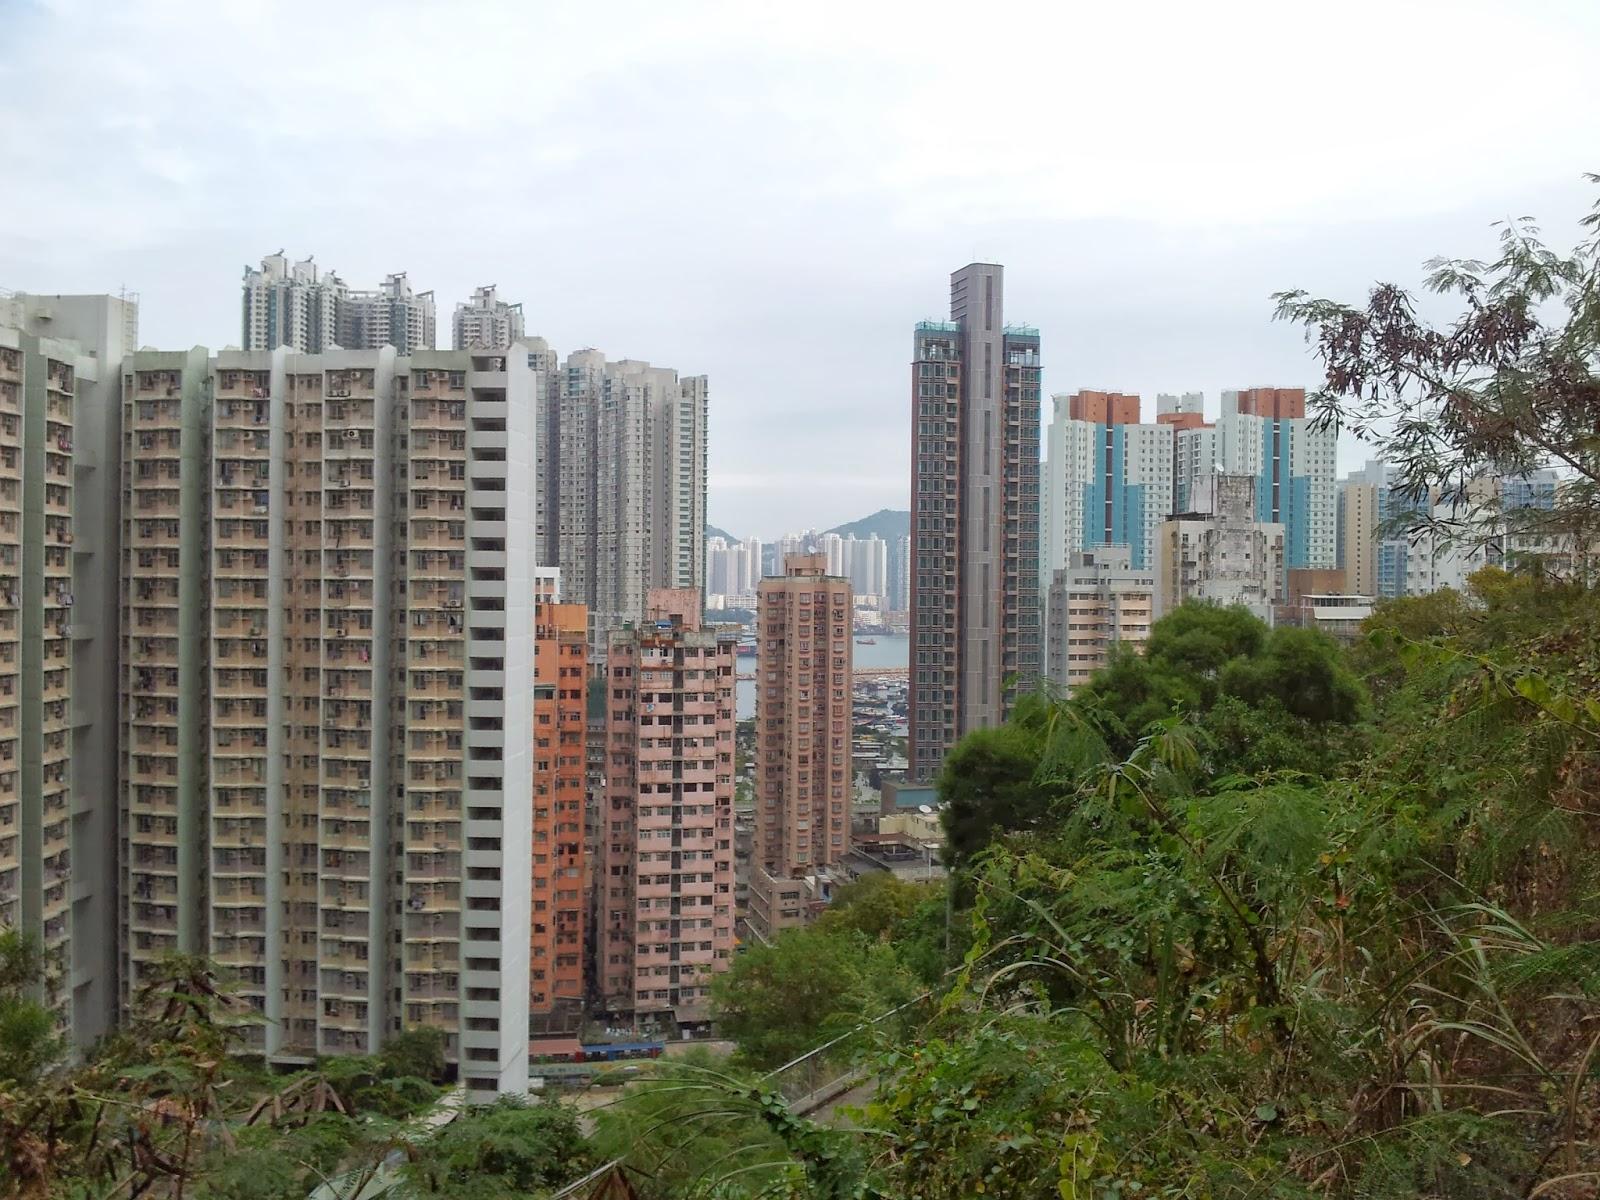 Grassroots O2: 巡視業務.領匯.耀東商場 @2013-11-02